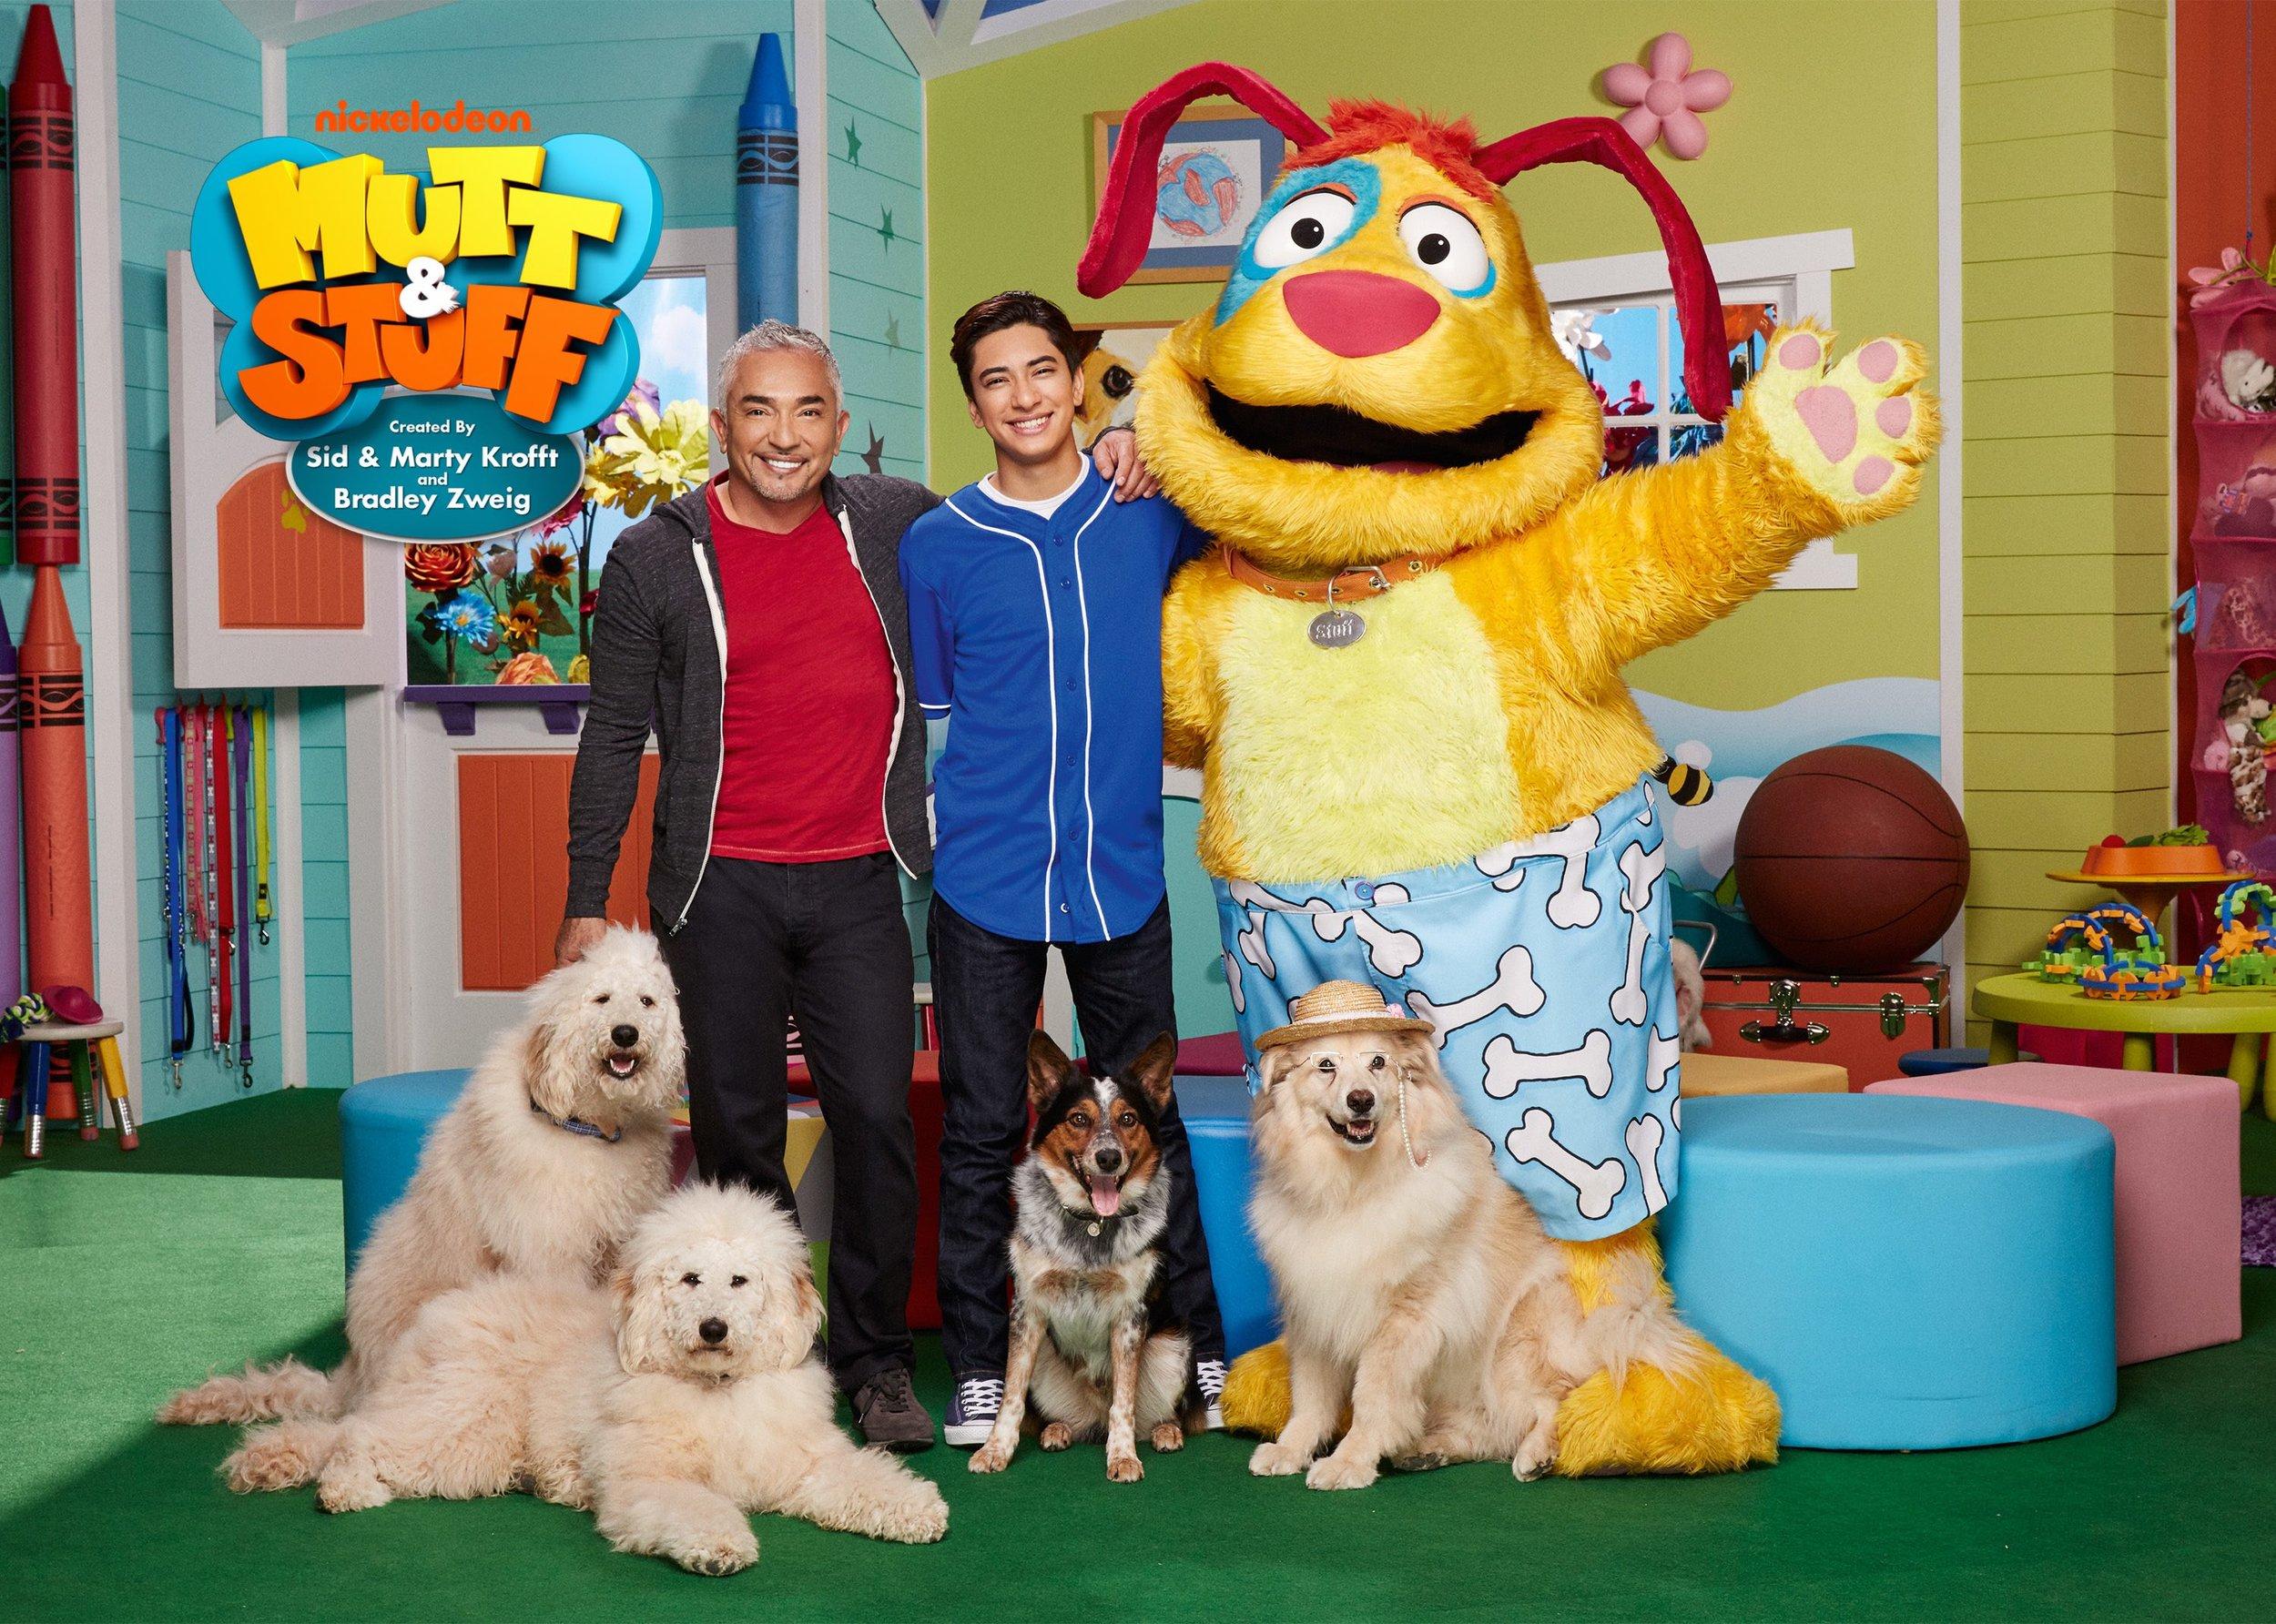 """Mutt & Stuff""   Krofft Pictures   Nickelodeon   Photo by Elizabeth Lippman"